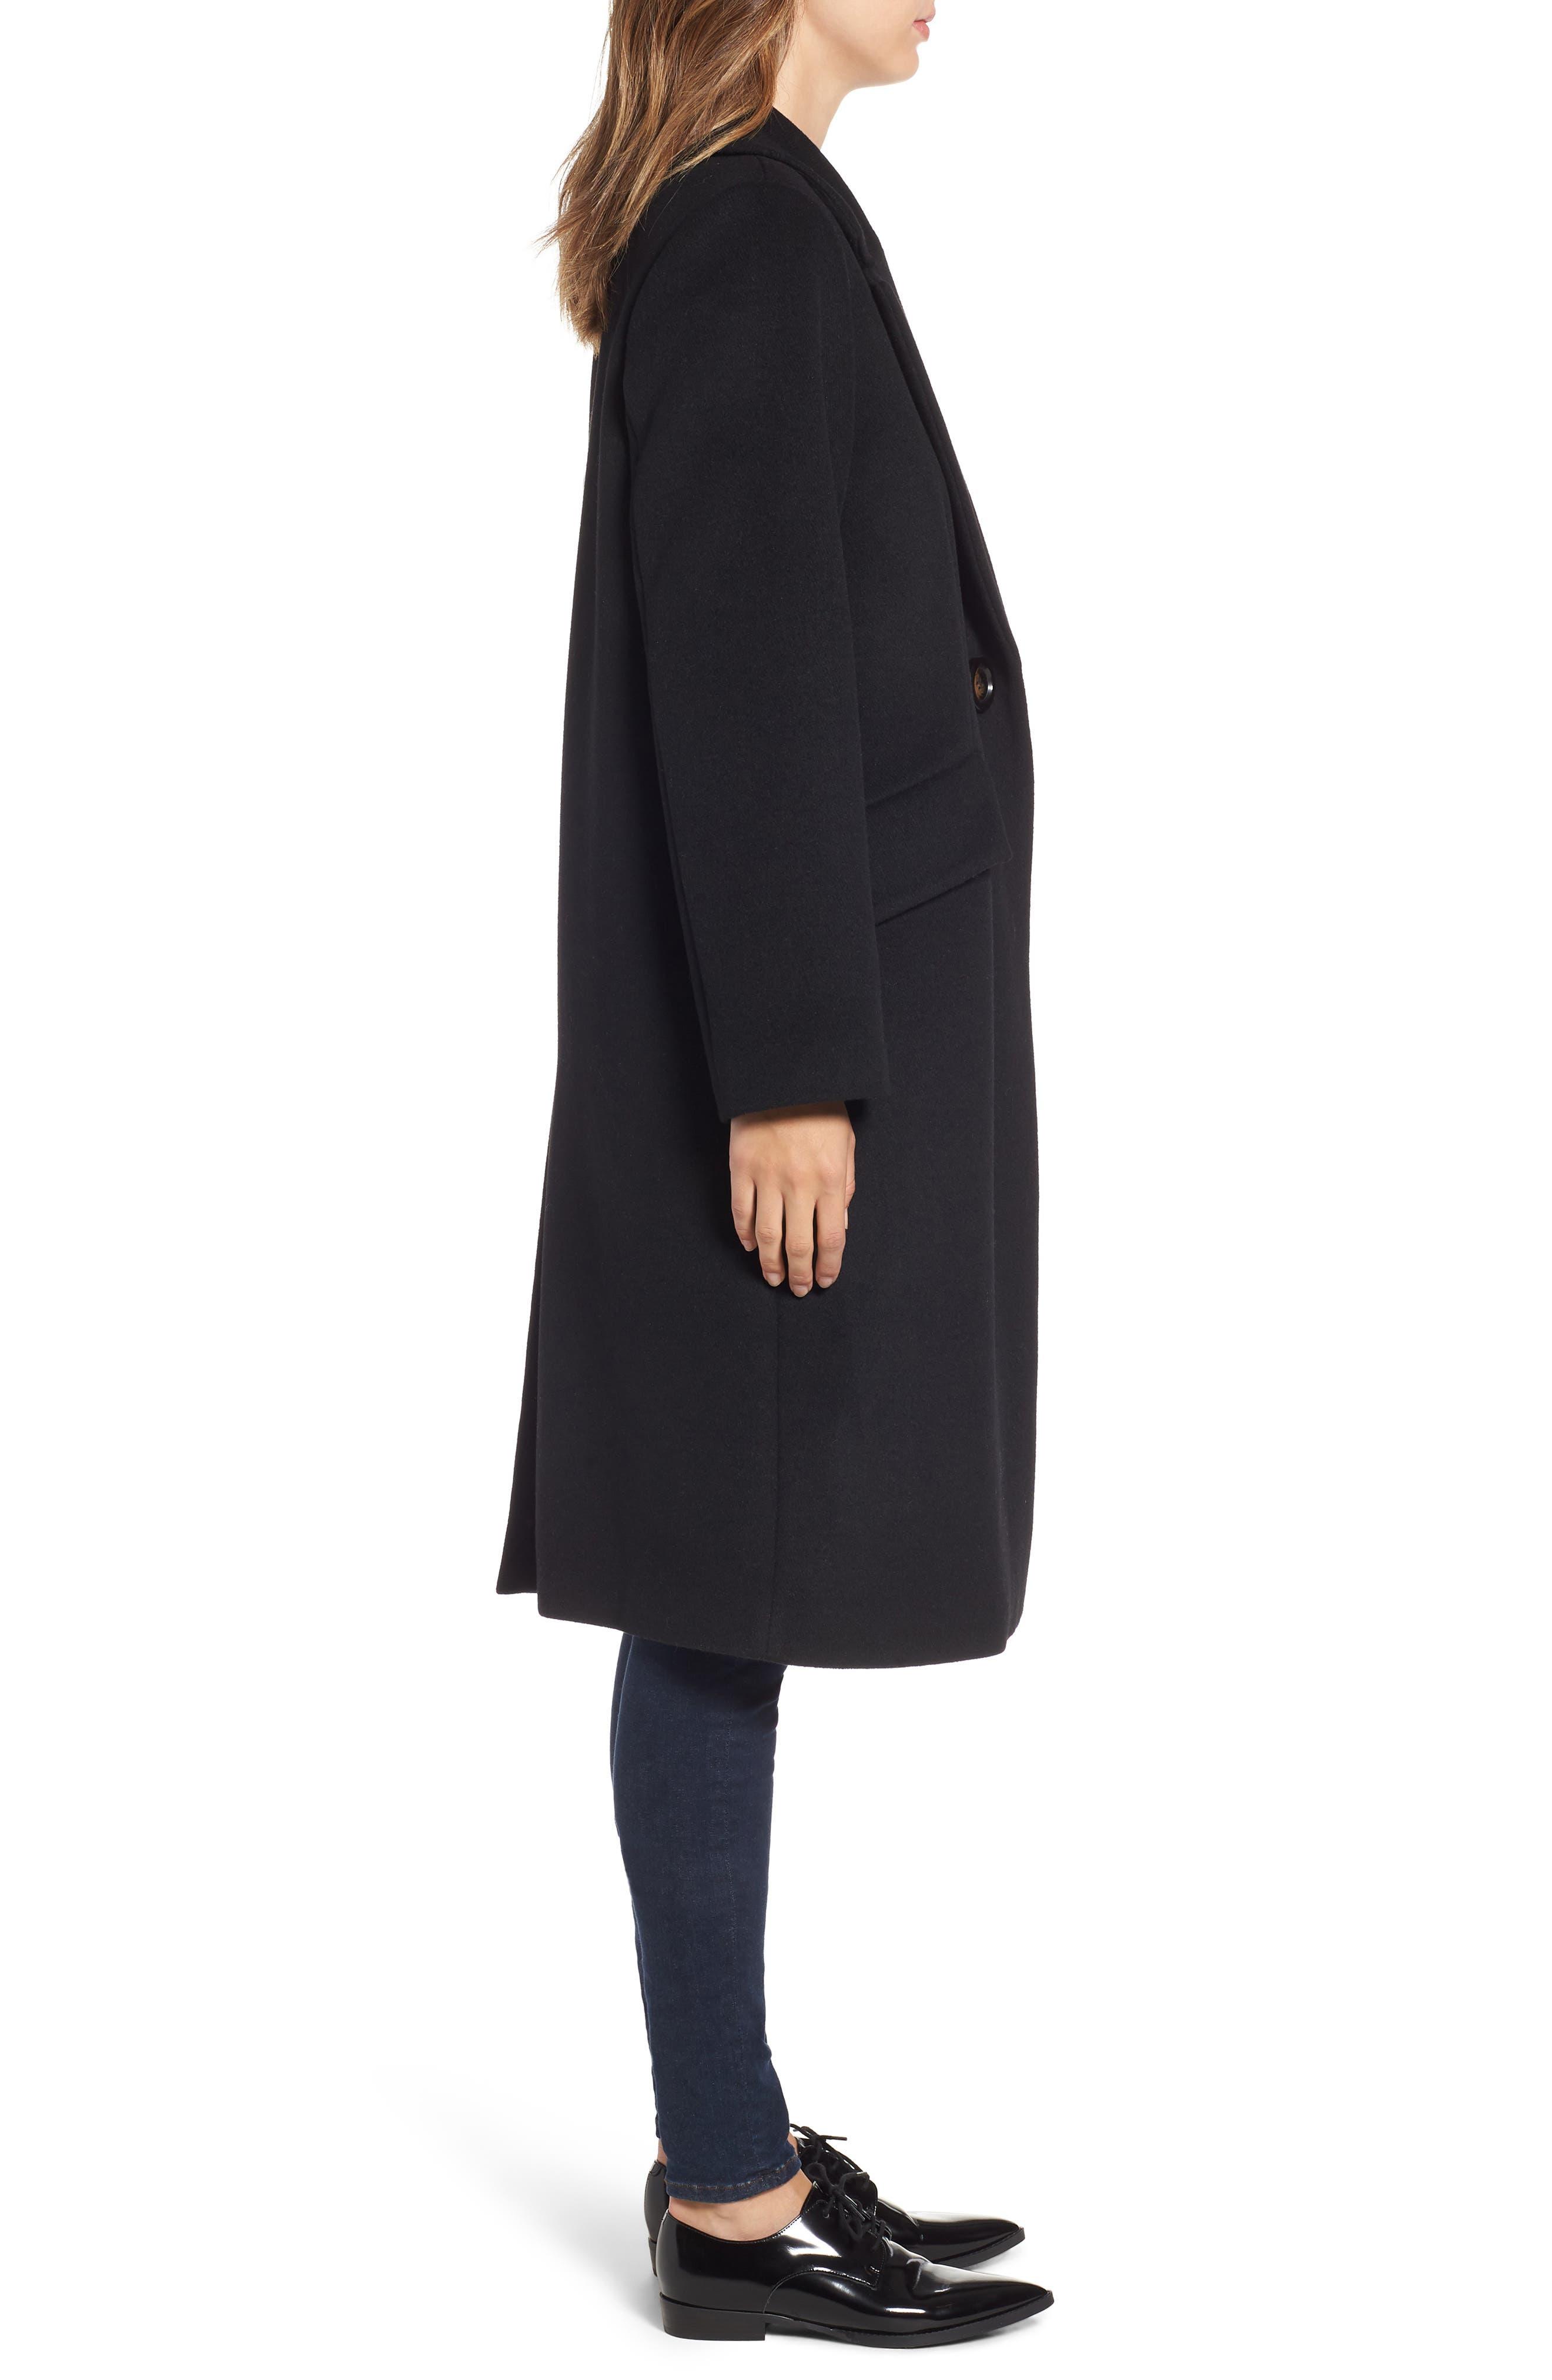 RACHEL RACHEL ROY, Wool Blend Coat, Alternate thumbnail 4, color, BLACK